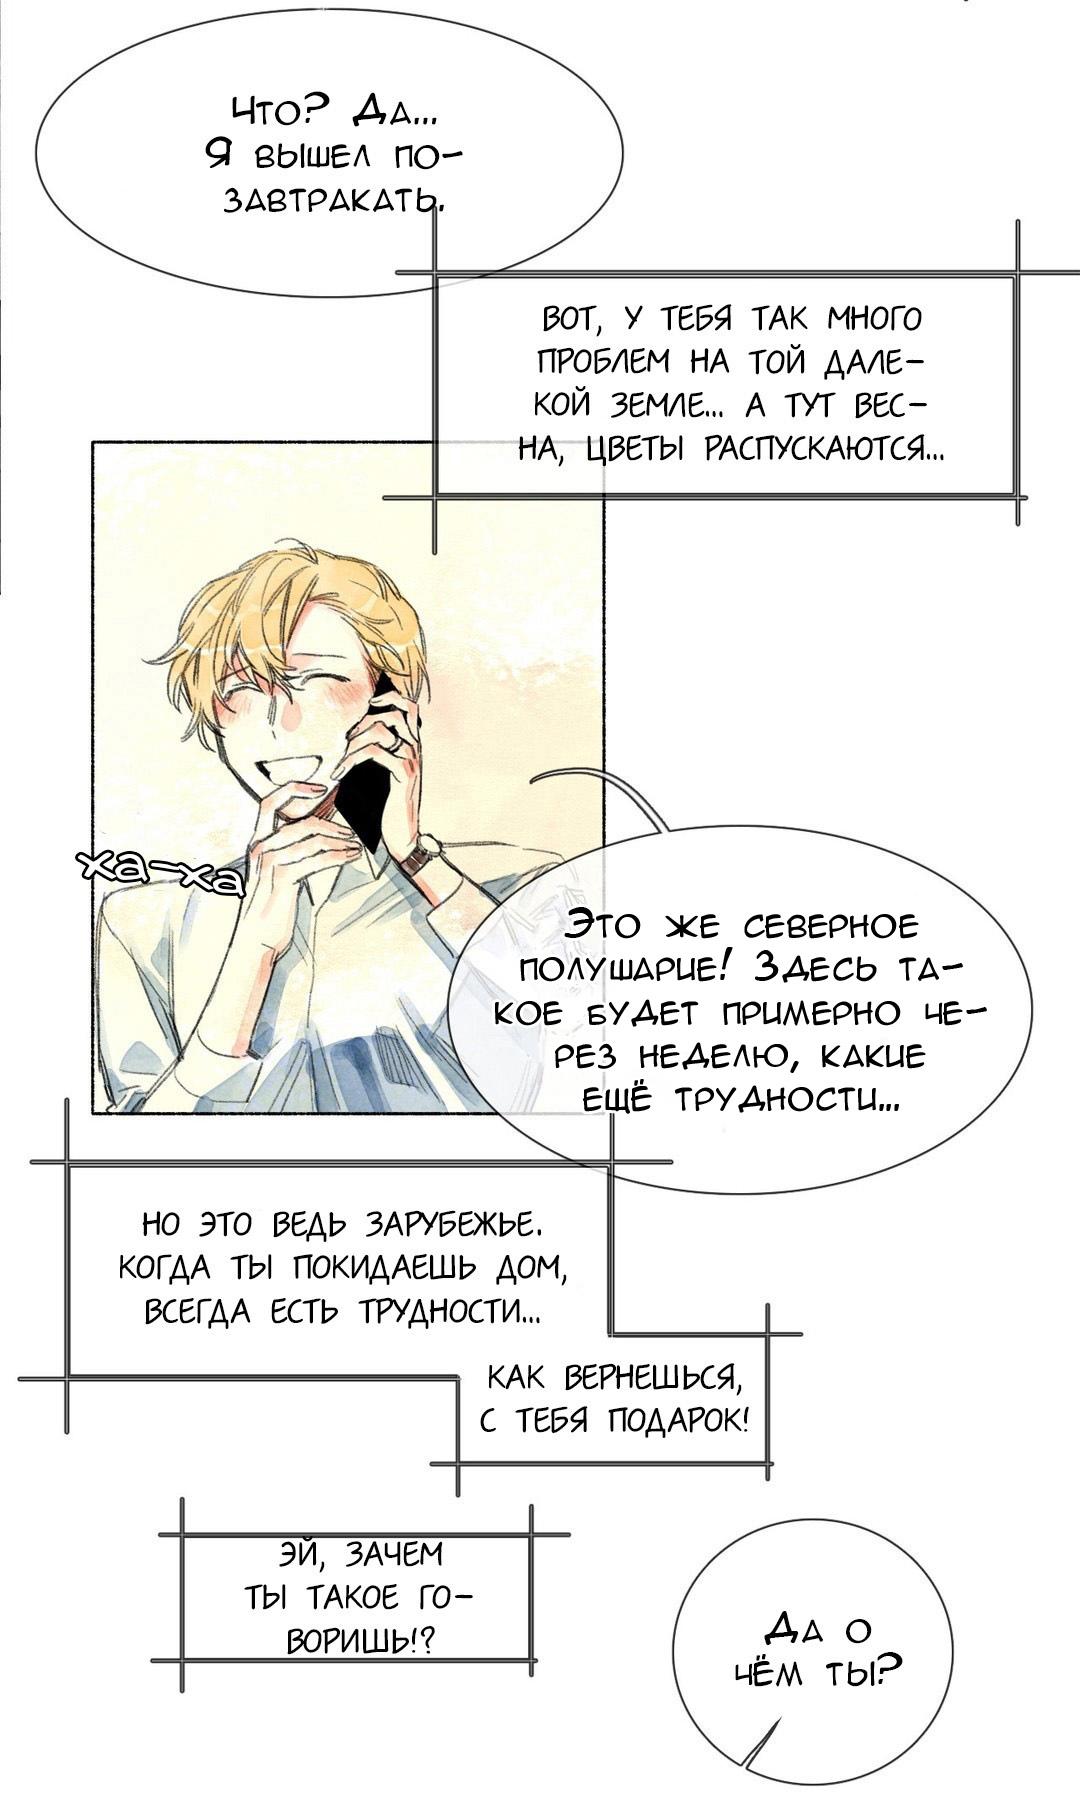 https://r2.ninemanga.com/comics/pic4/36/37860/1339494/1557622982829.jpg Page 34